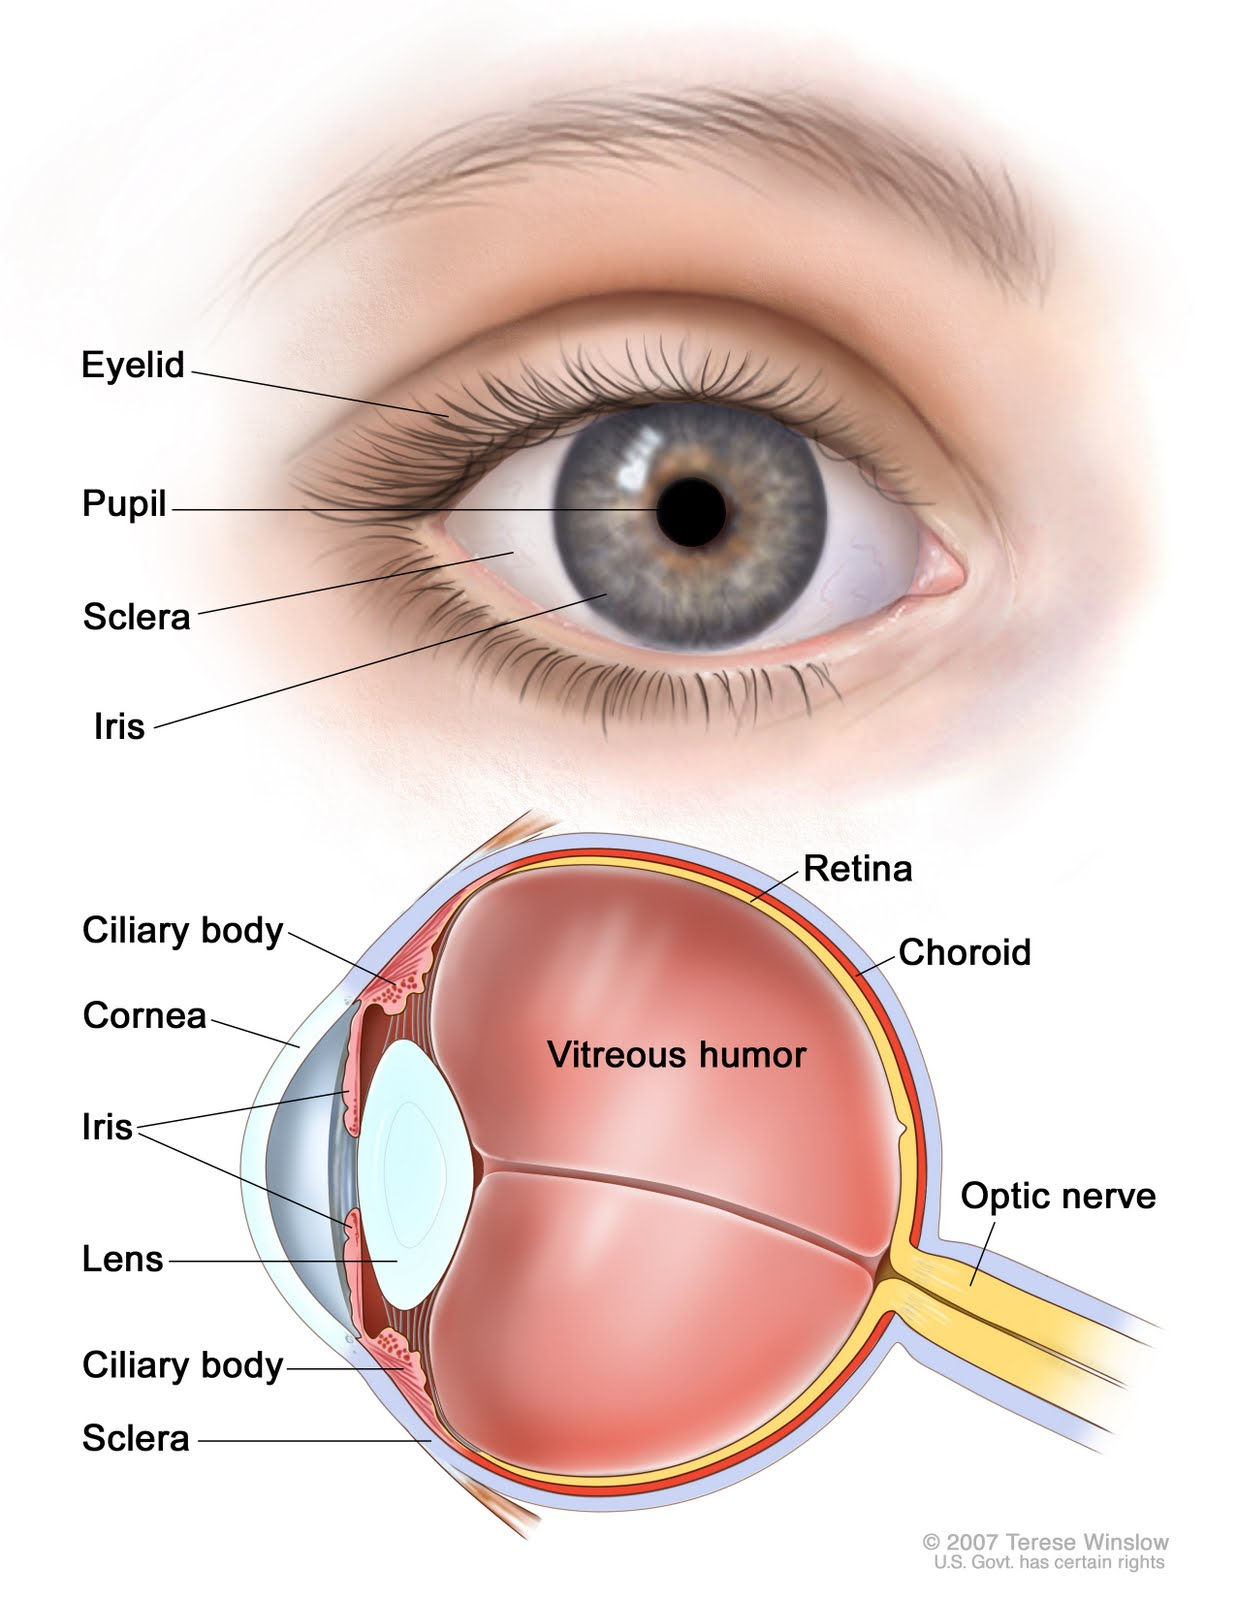 hight resolution of eye diagram diagram of the eye eye diagrams human eye human official eye chart eye chart diagram